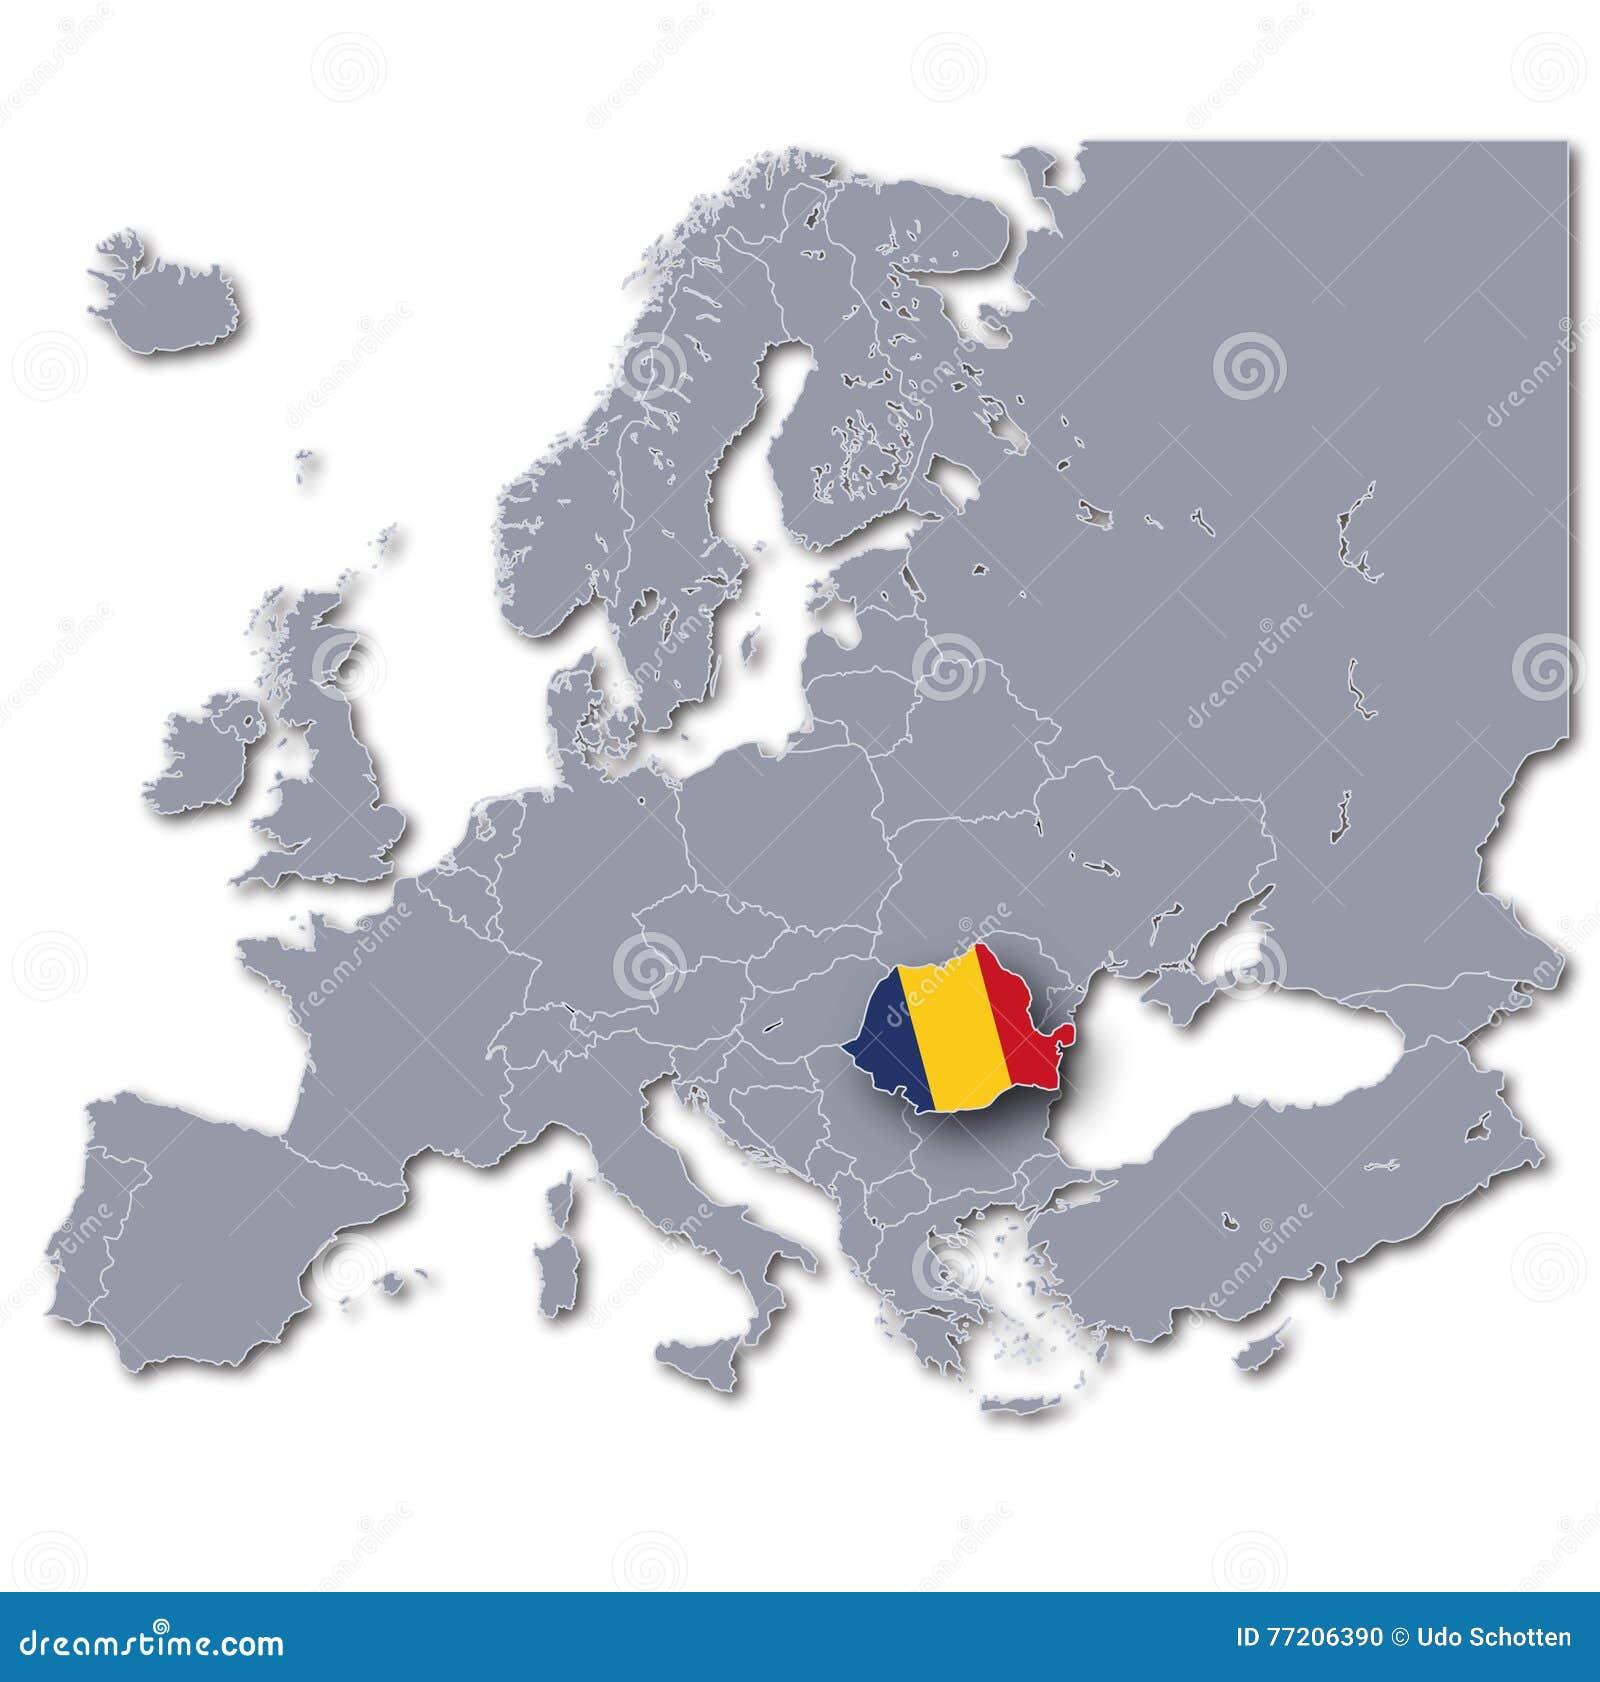 Europe Map With Romania Stock Photo Image Of Push Icon 77206390